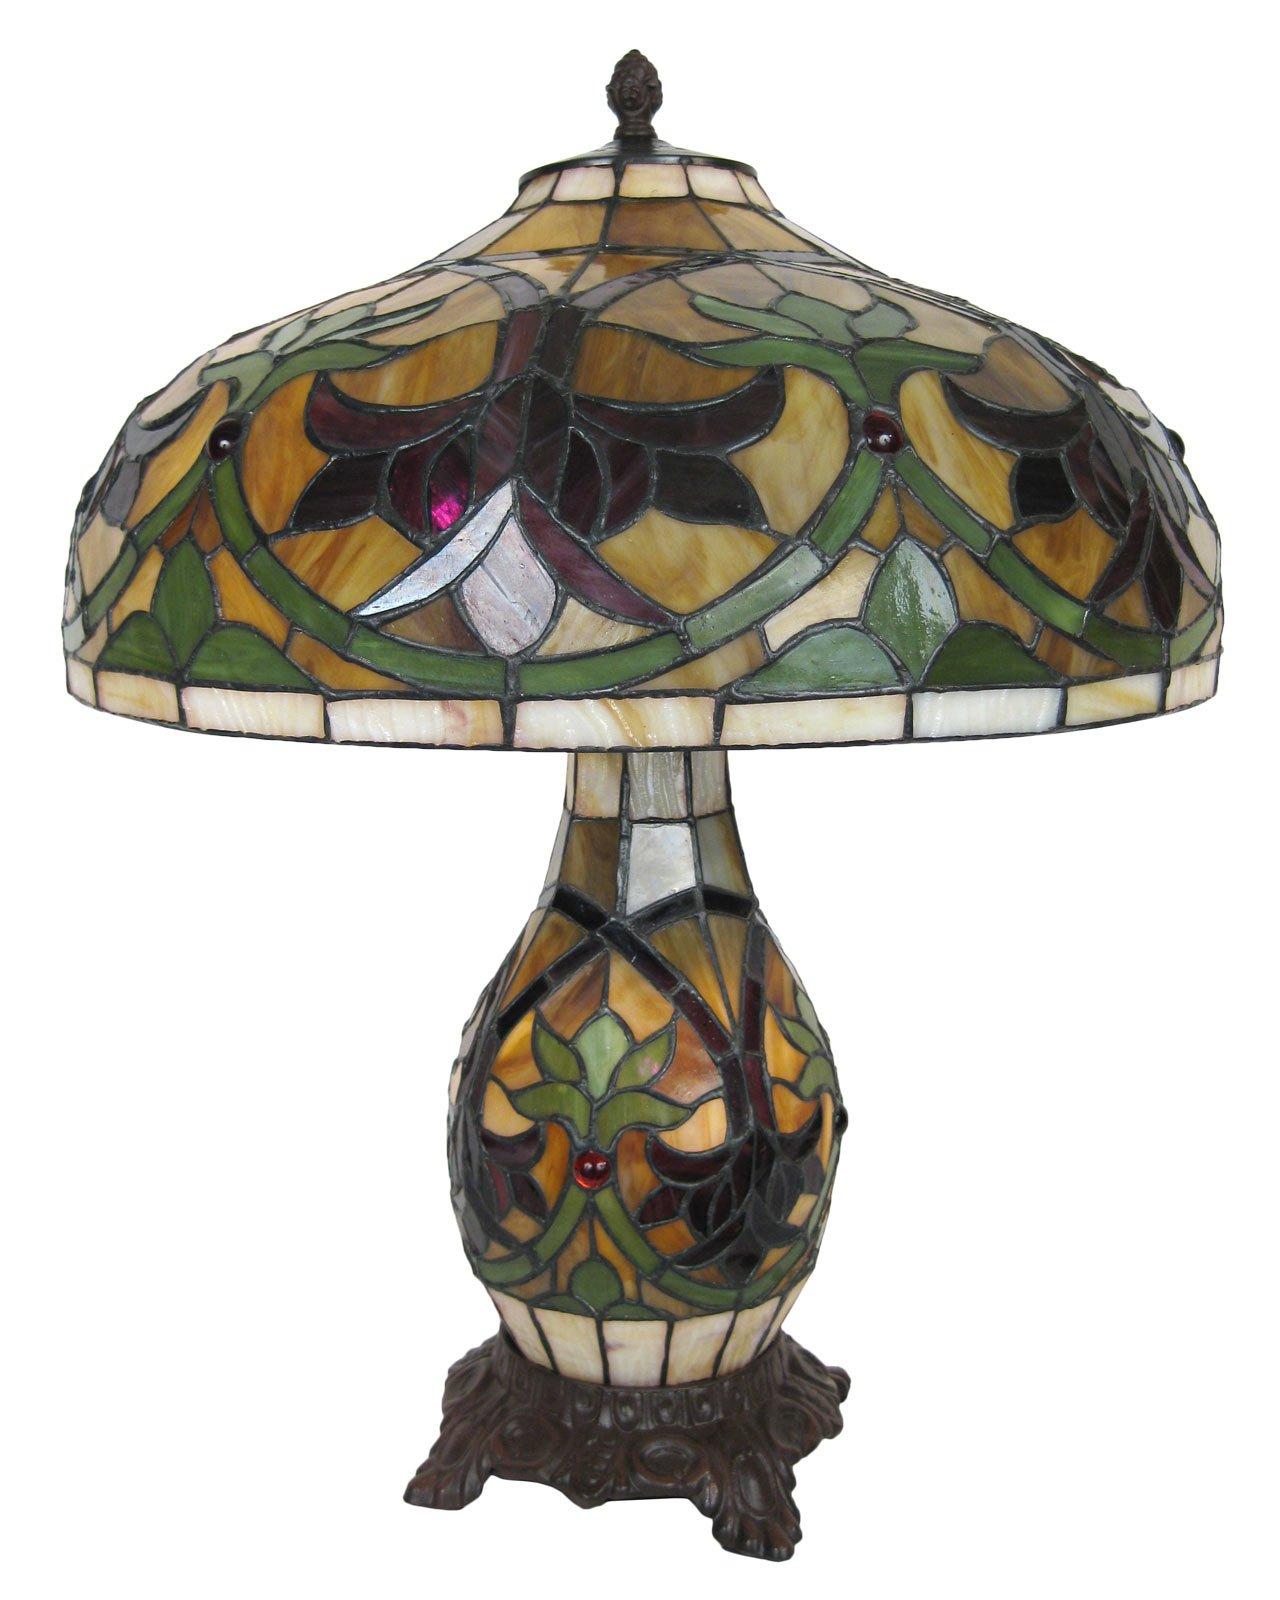 Himalayan Lamp Natural Healing Pink Dimmable lamps UK Plug /& Bulb 12-15 KG